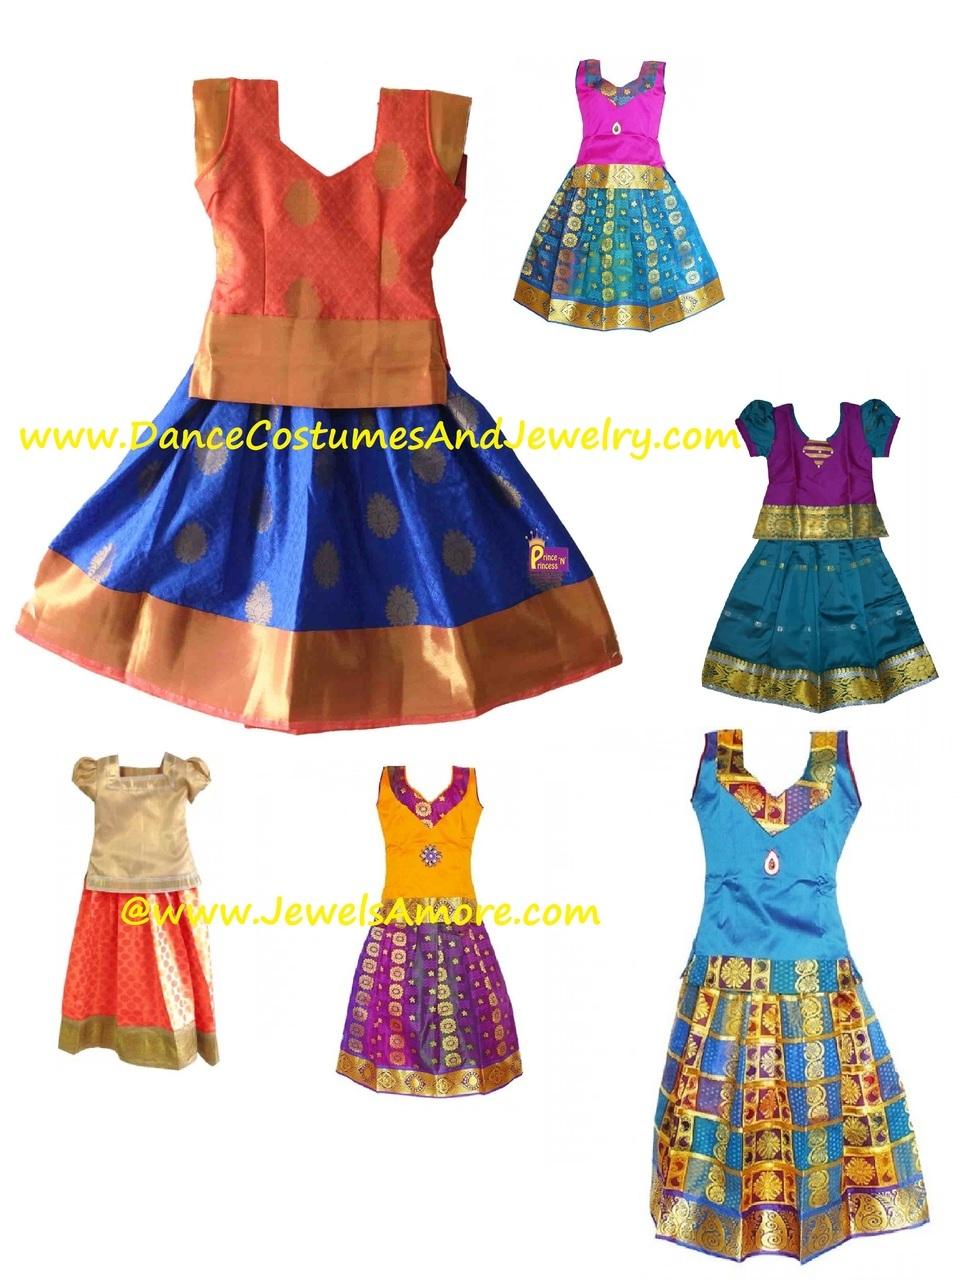 Pattupavadai clipart picture transparent library Custom Stitch Pattu Pavadai and Blouse for girls up to 5 Yrs picture transparent library